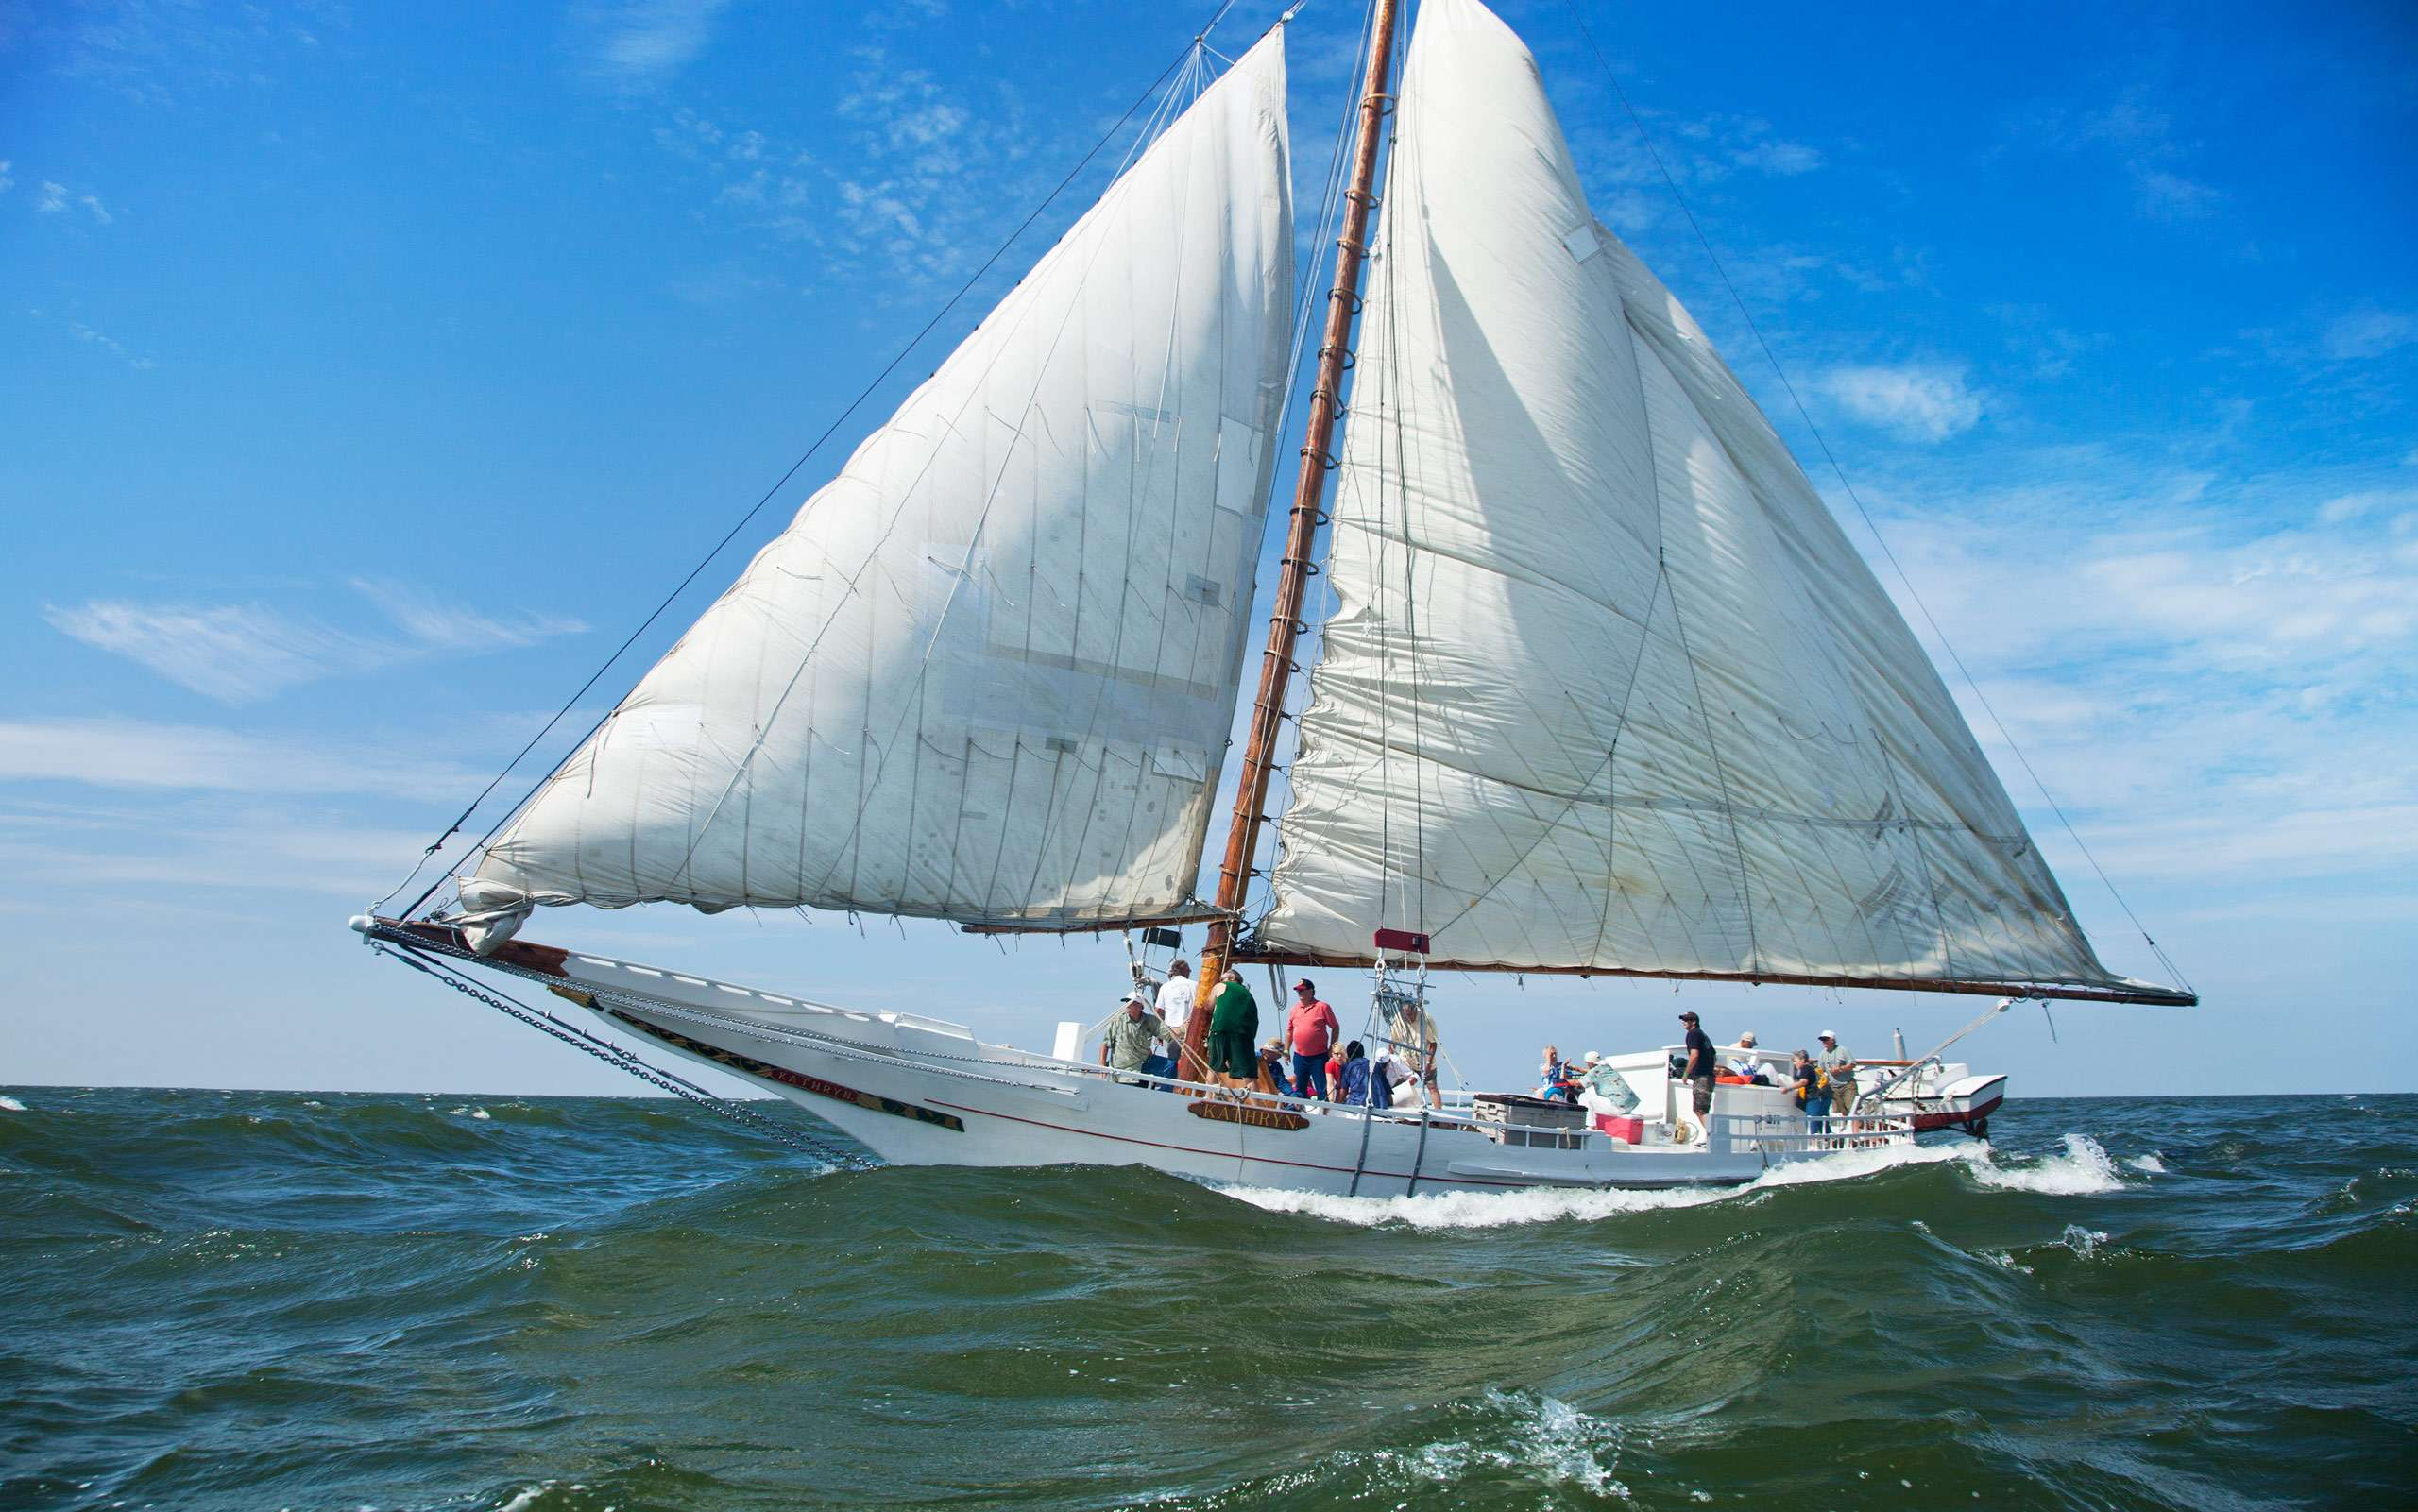 PORTFOLIO - Sailing - Skipjacks #14